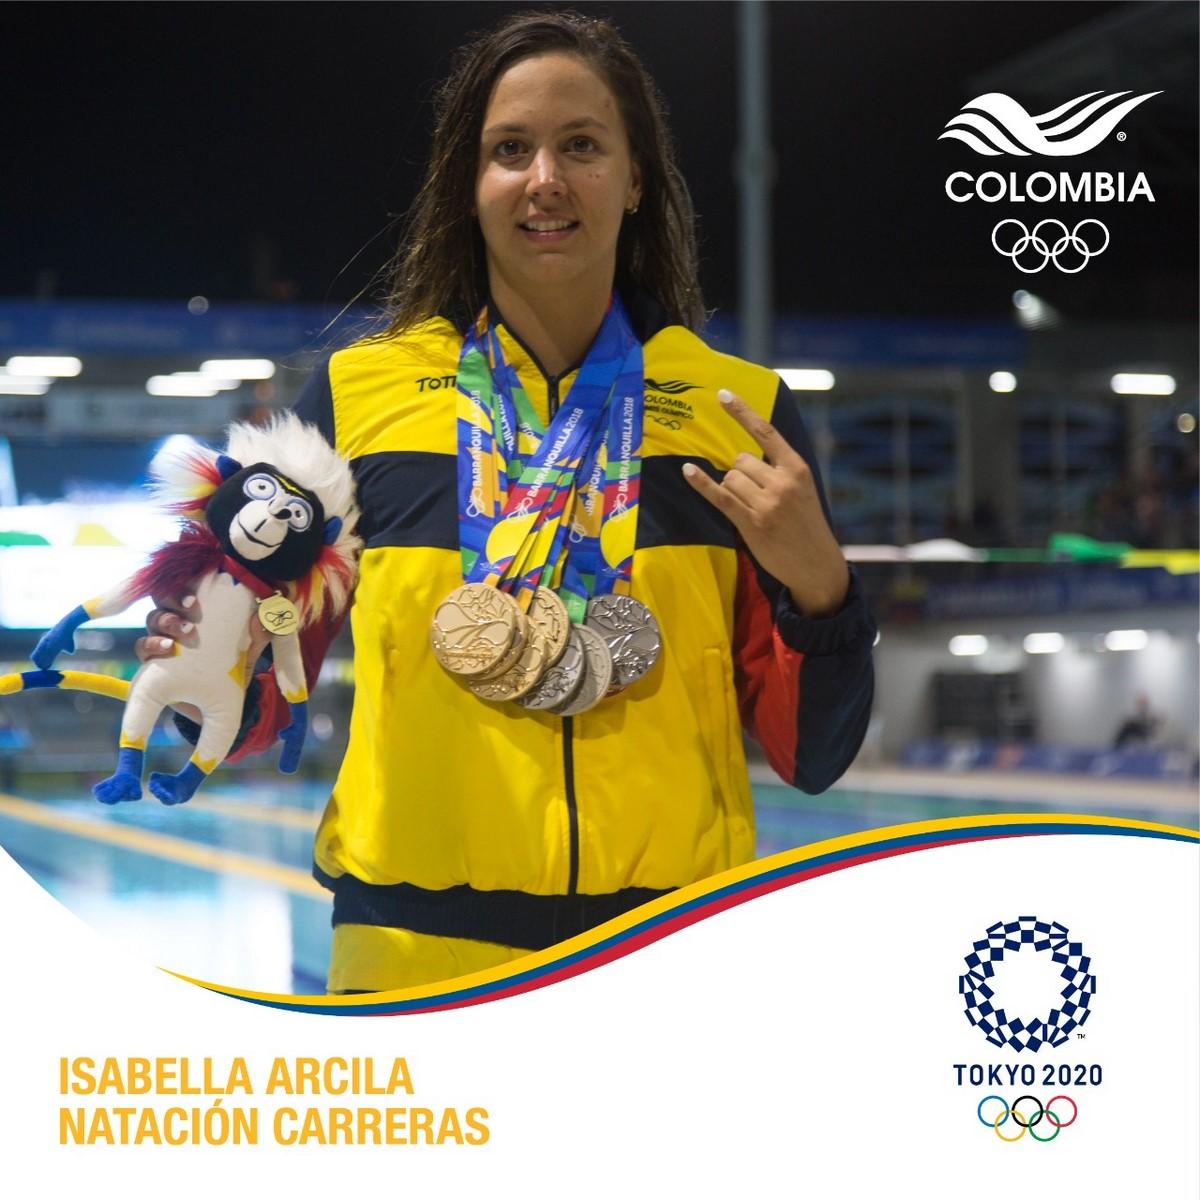 Isabella Arcila